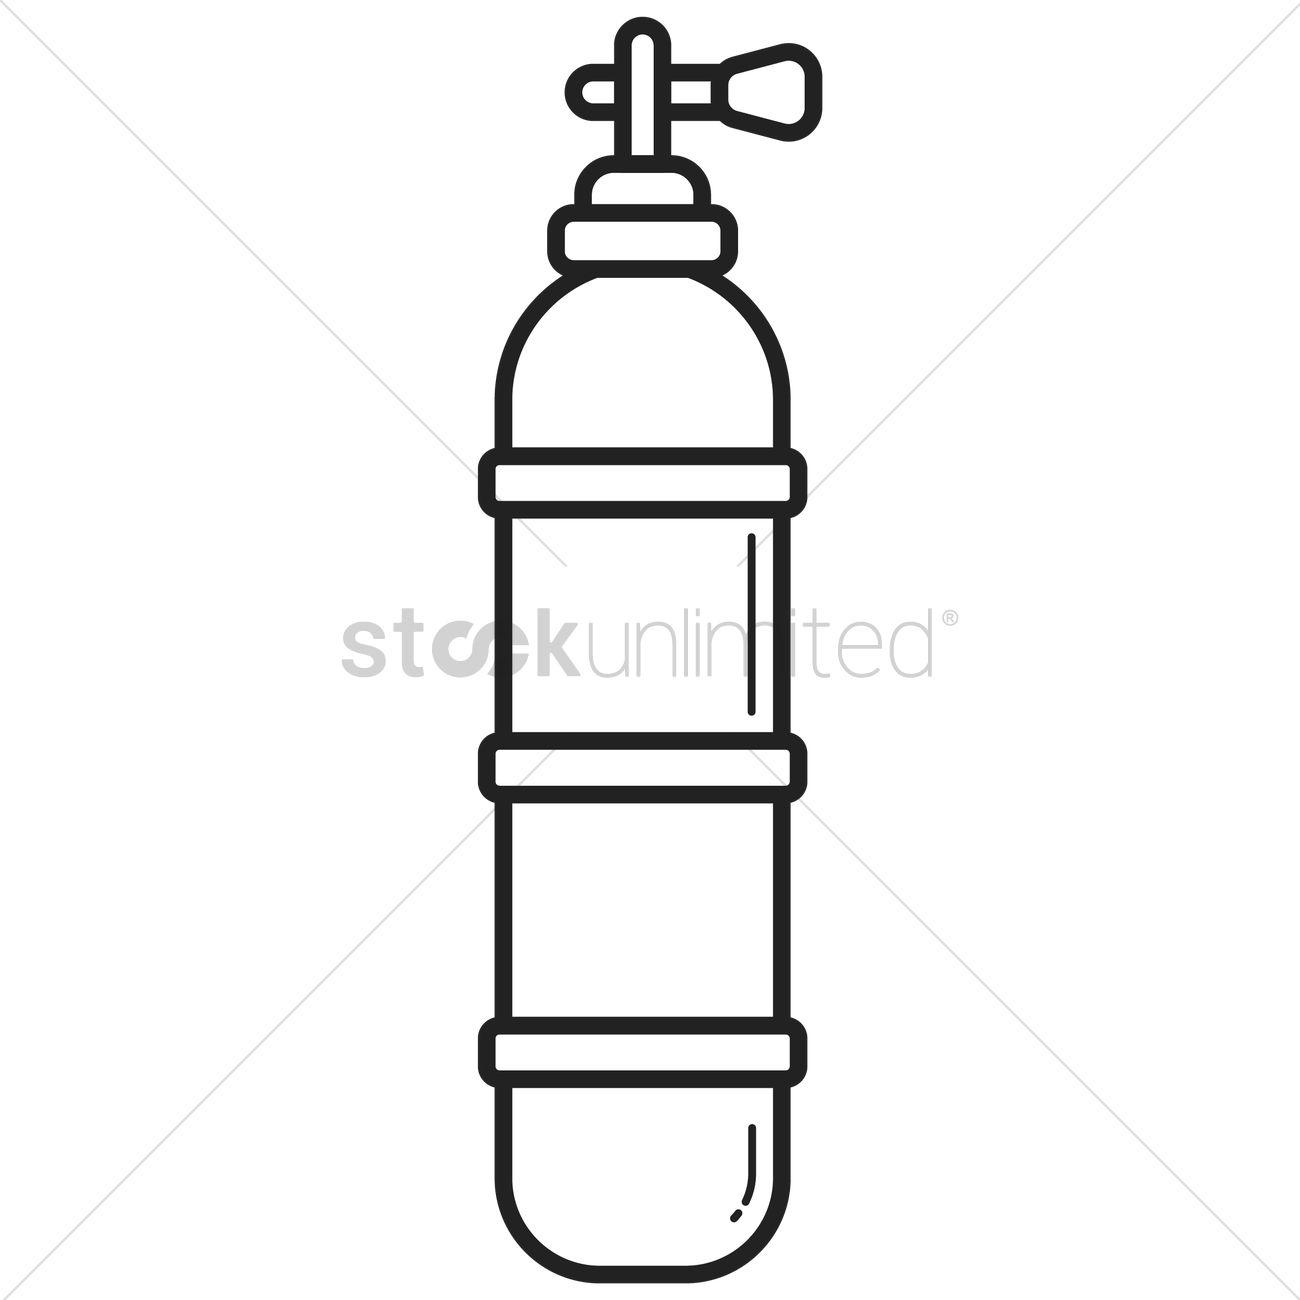 how to make an oxygen tank